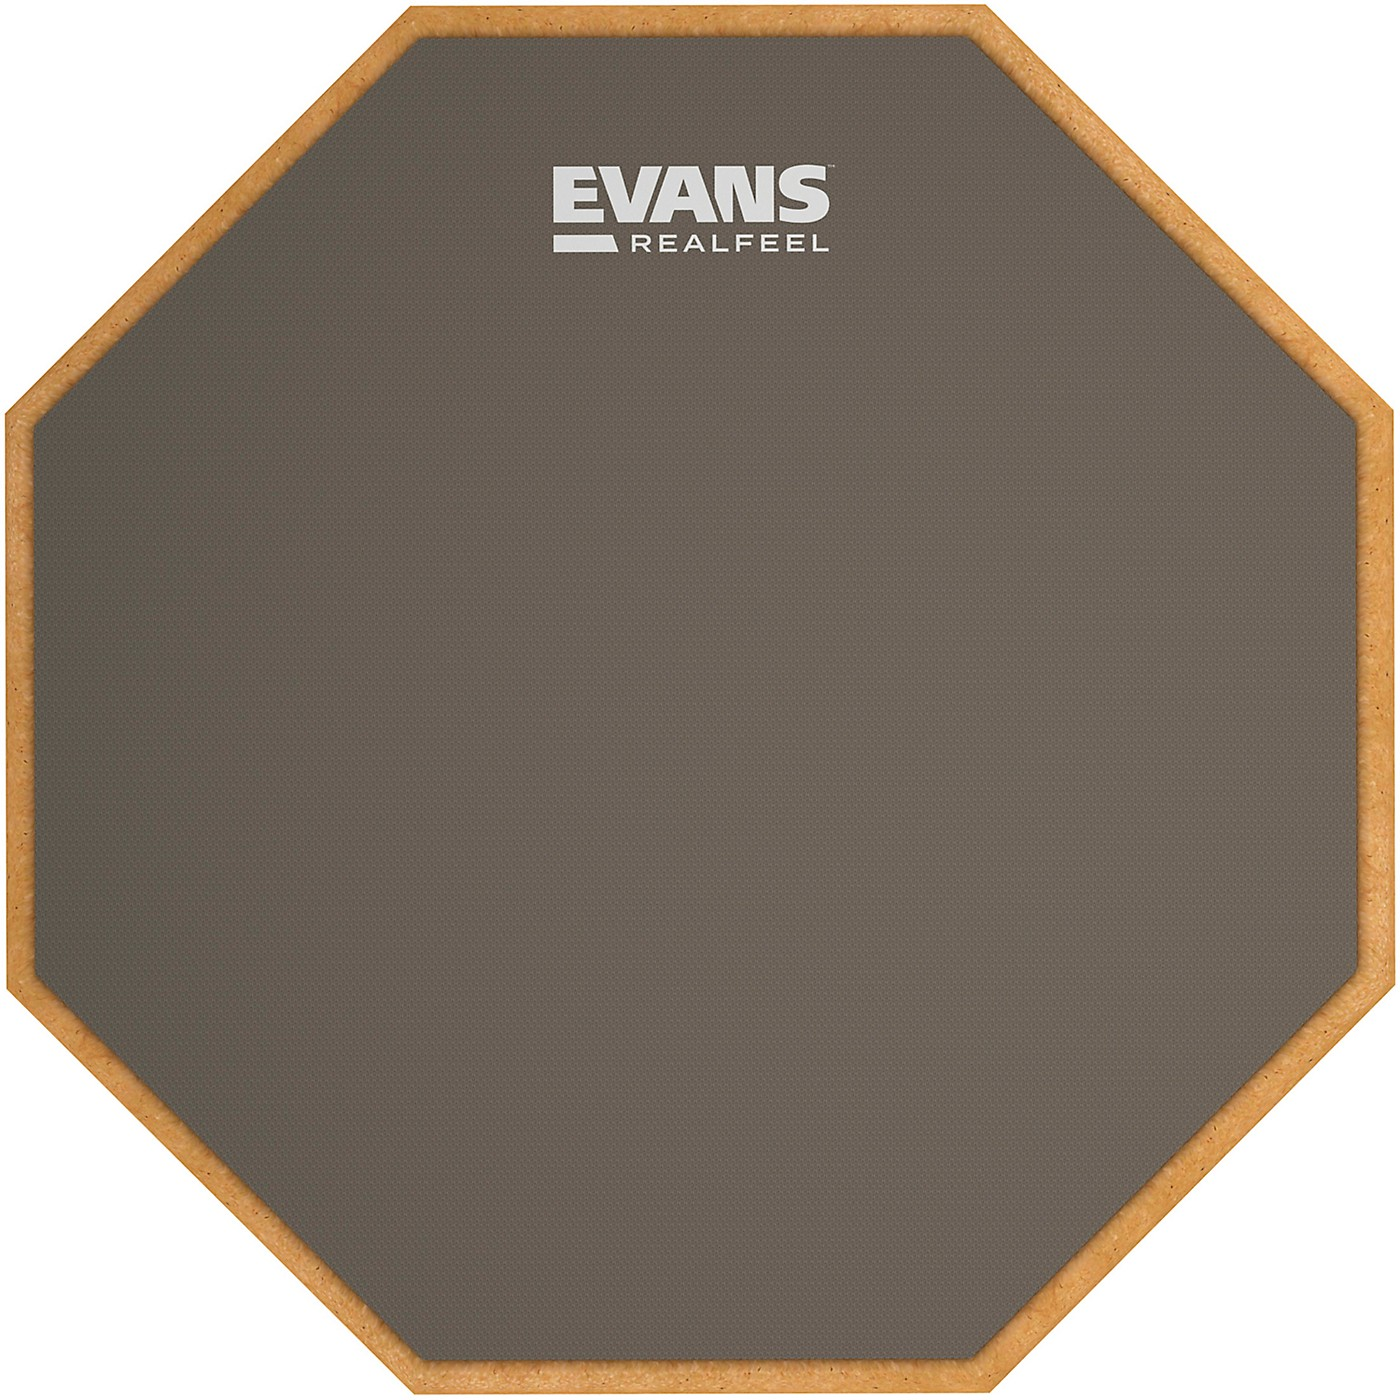 Evans Mountable Speed Pad thumbnail